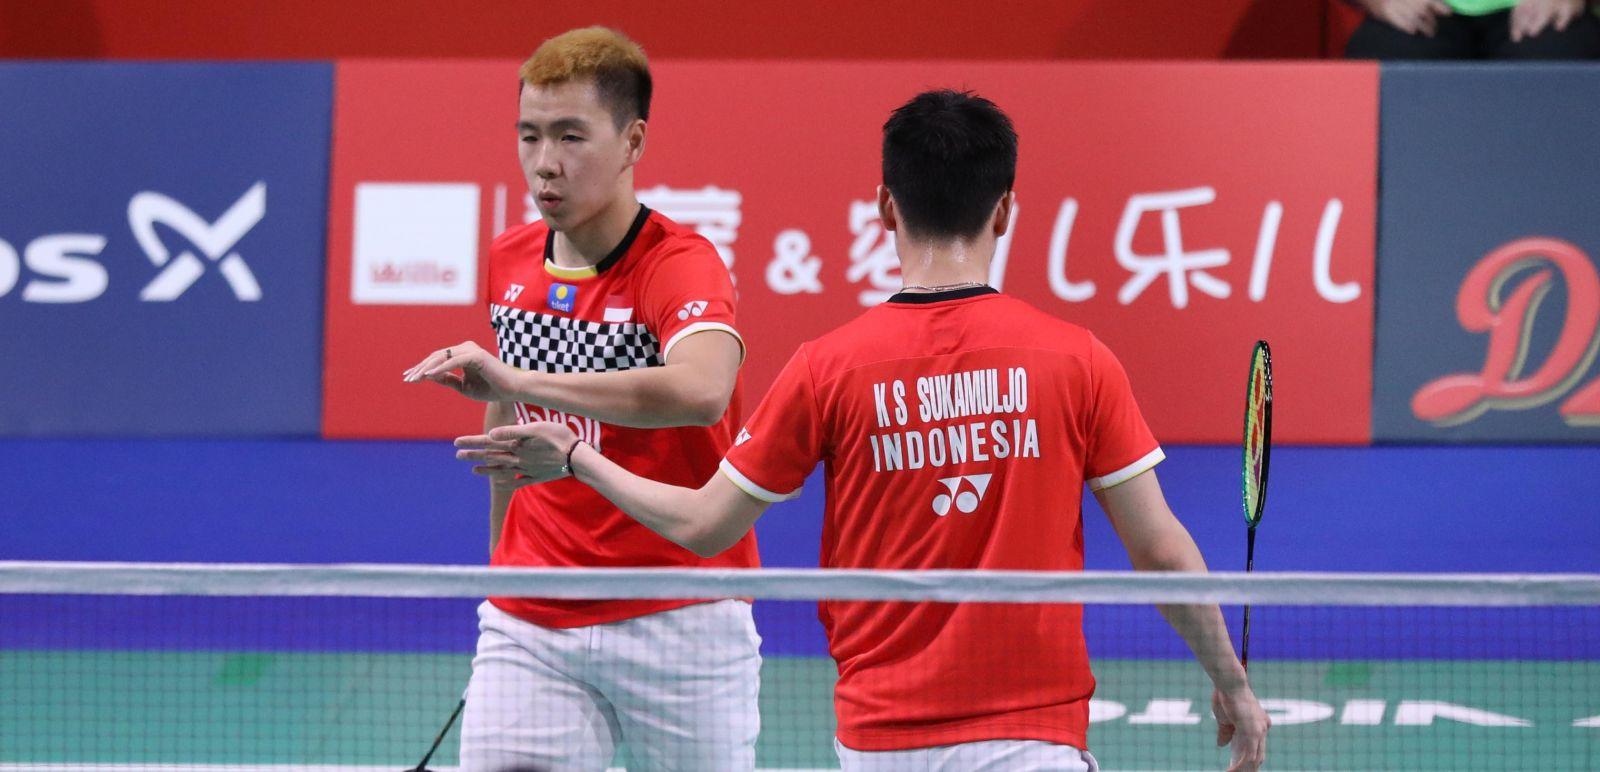 Ganda putra Indonesia Kevin Sanjaya Sukamuljo/Marcus Fernaldi Gideon alias Minions berpeluang mengukir rekor hebat pada Fuzhou China Open 2019. Foto: PBSI